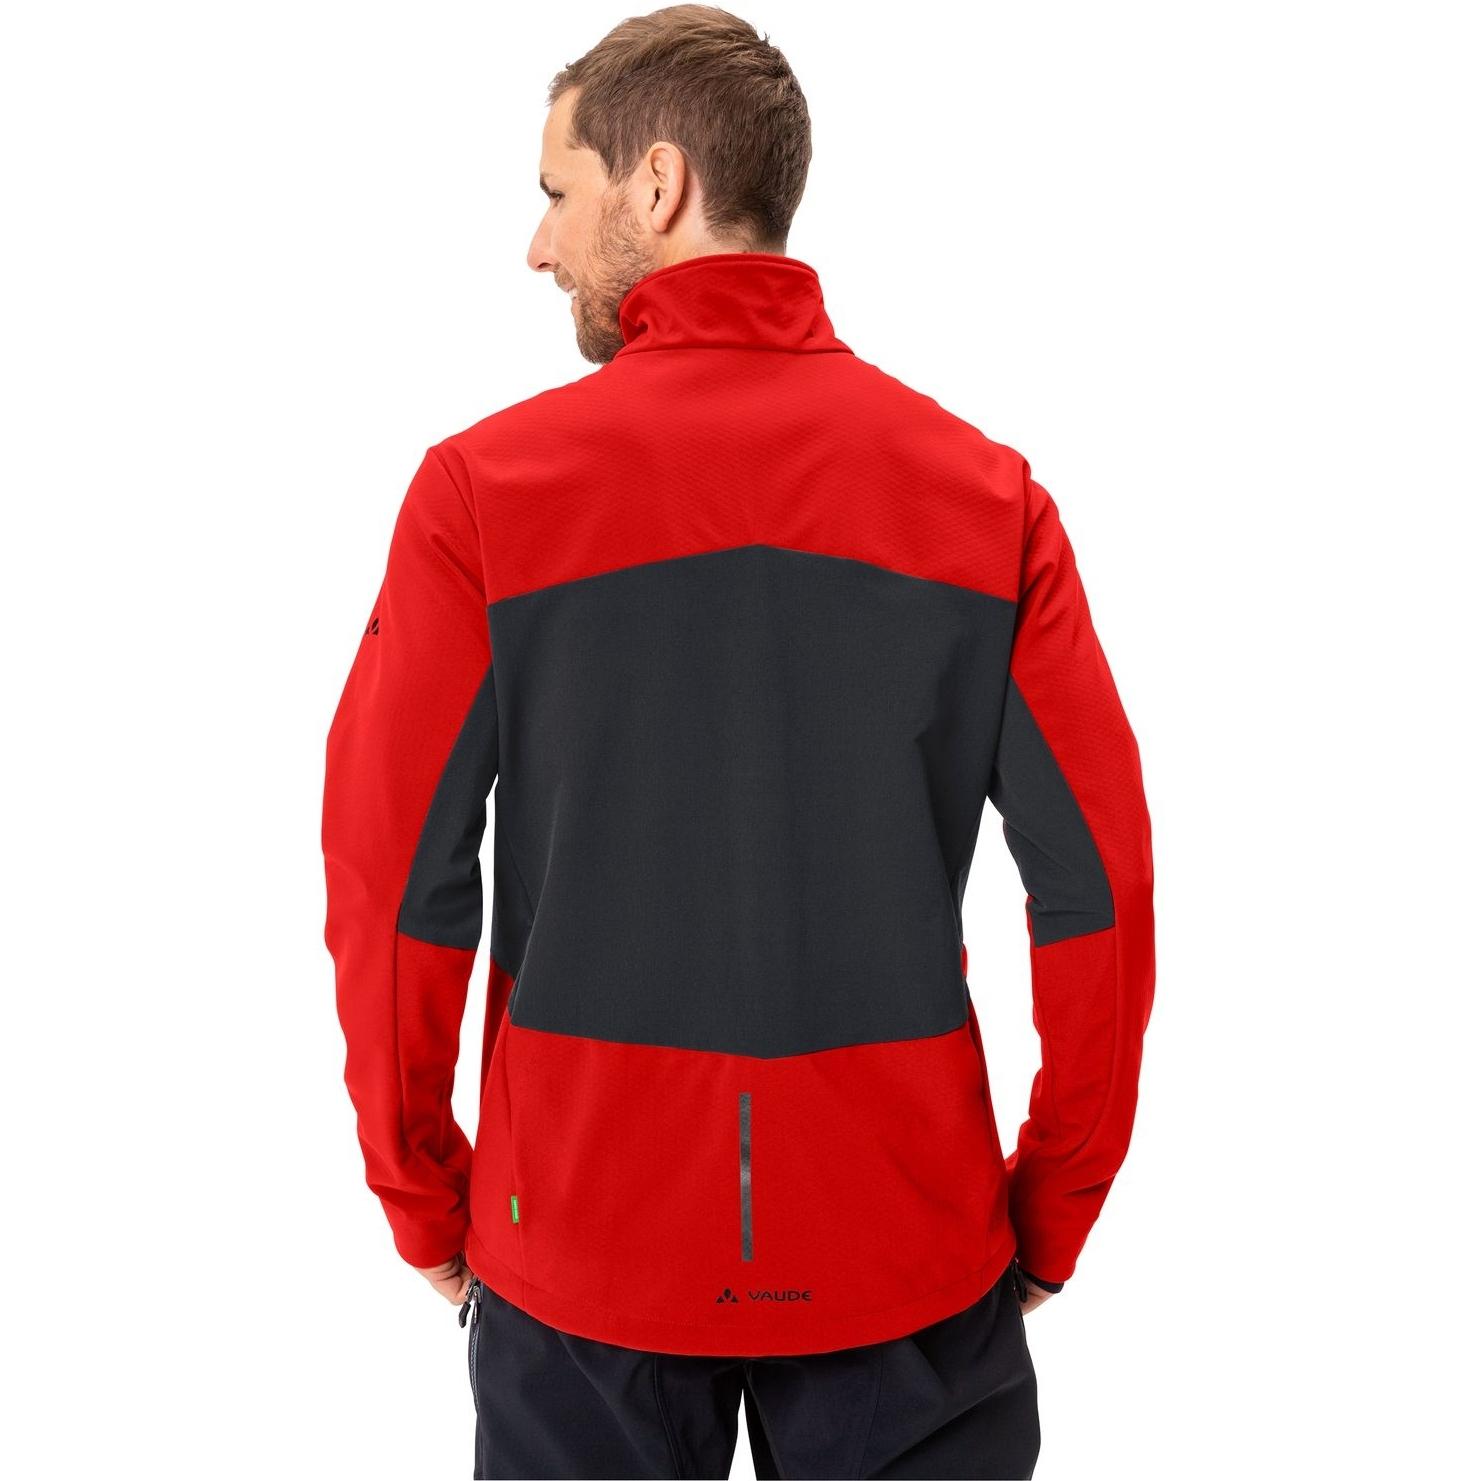 Image of Vaude Men's Virt Softshell Jacket II - mars red